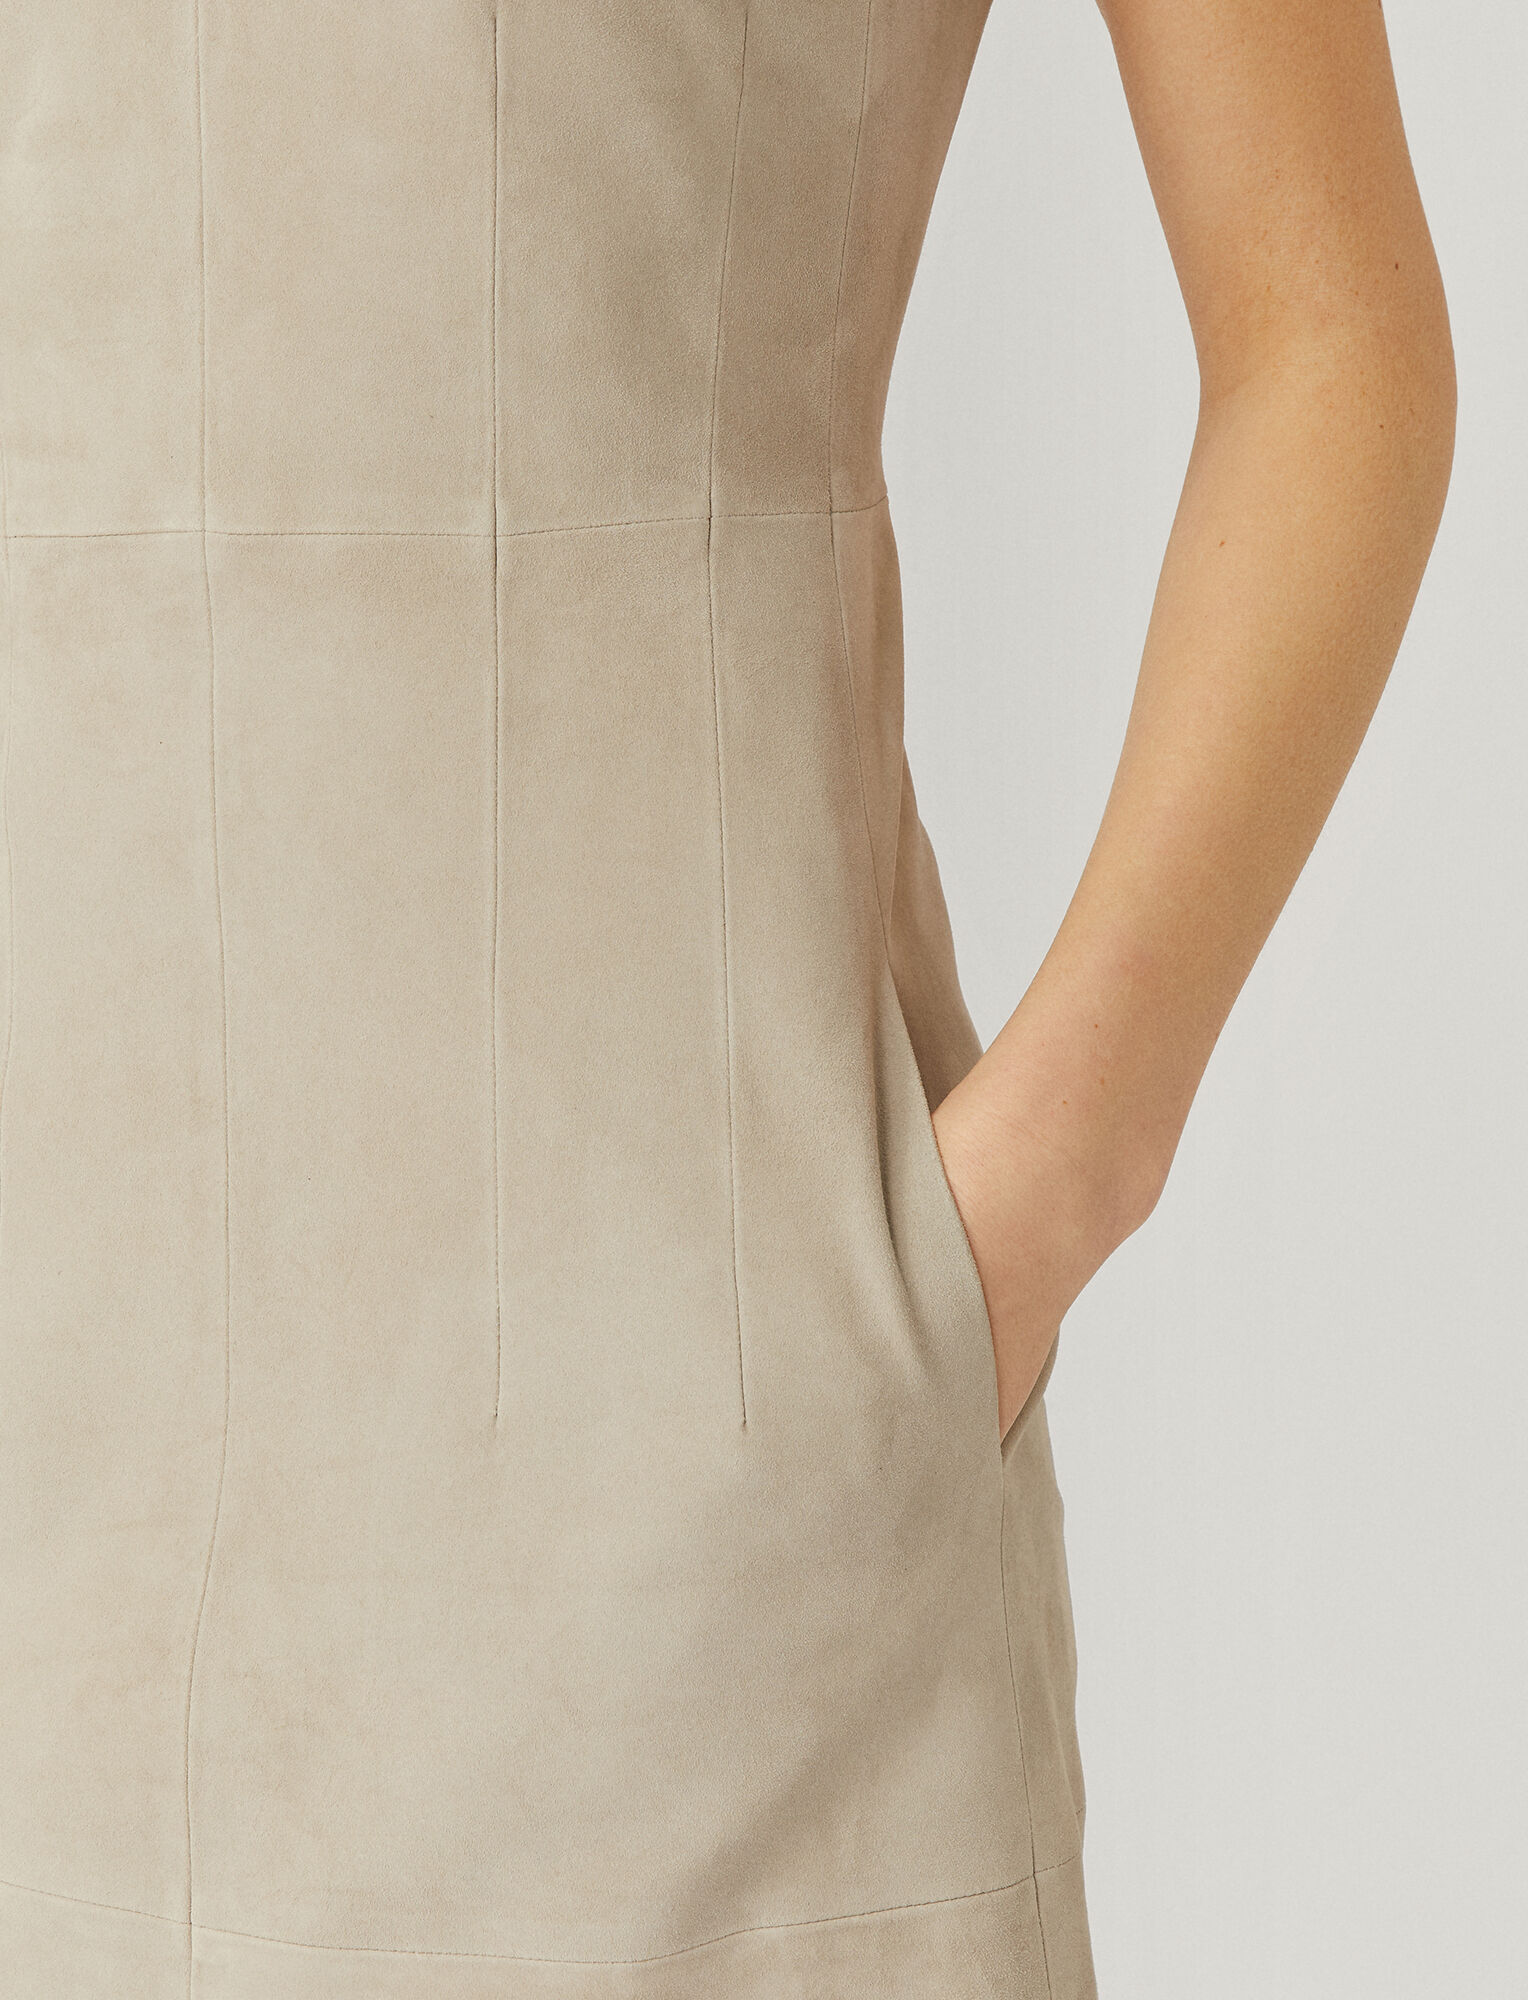 Joseph, Suede Nappa Cover Danty Dress, in CLOUD